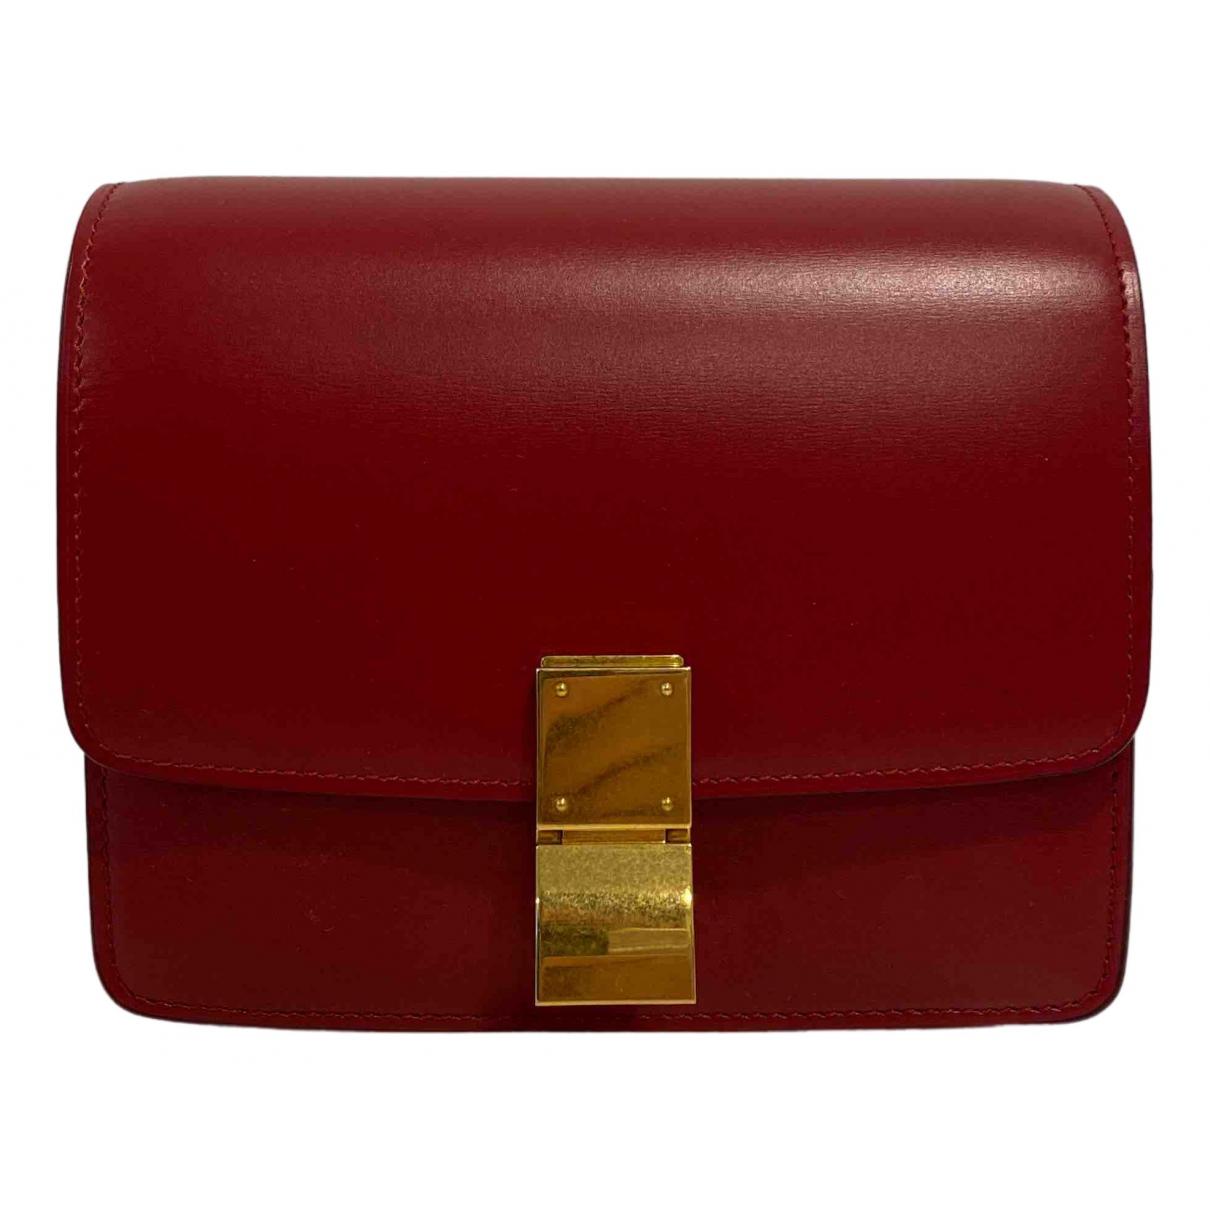 Celine Classic Handtasche in  Rot Leder